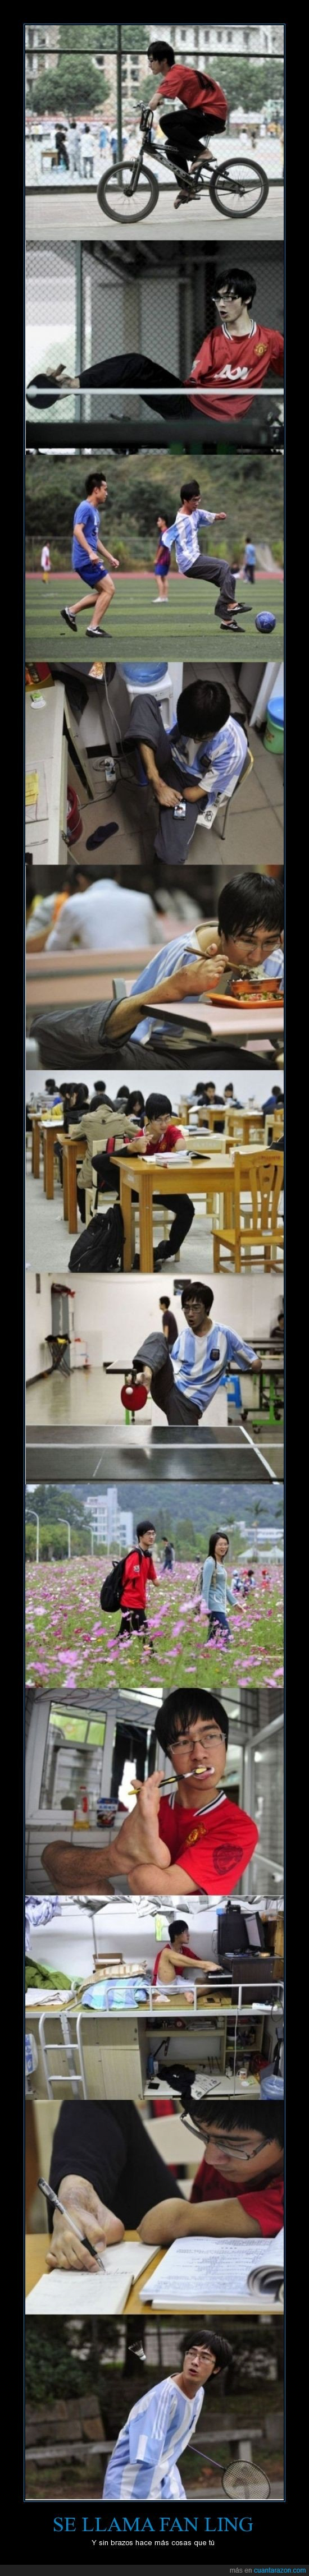 badminton,brazo,chino,fan ling,superacion